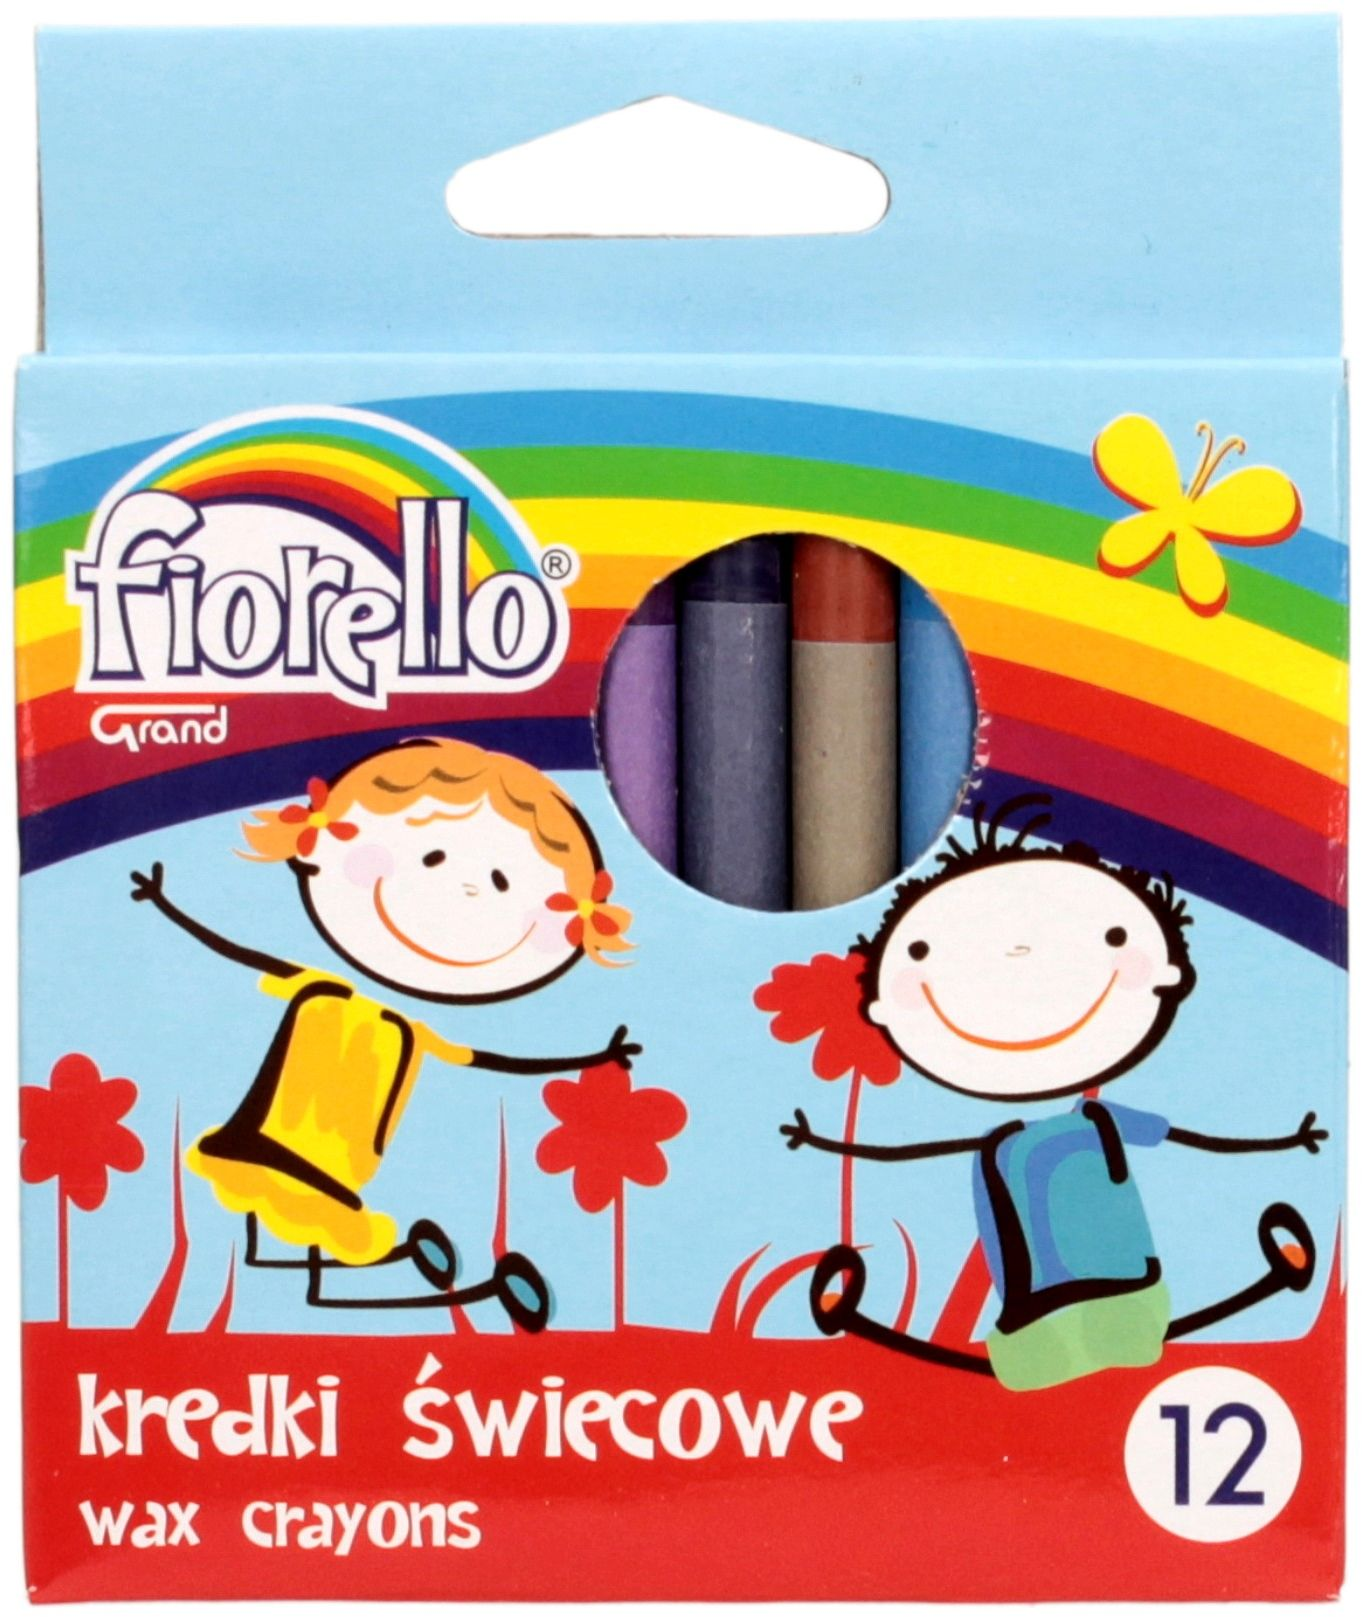 Kredki świecowe 12kol Fiorello